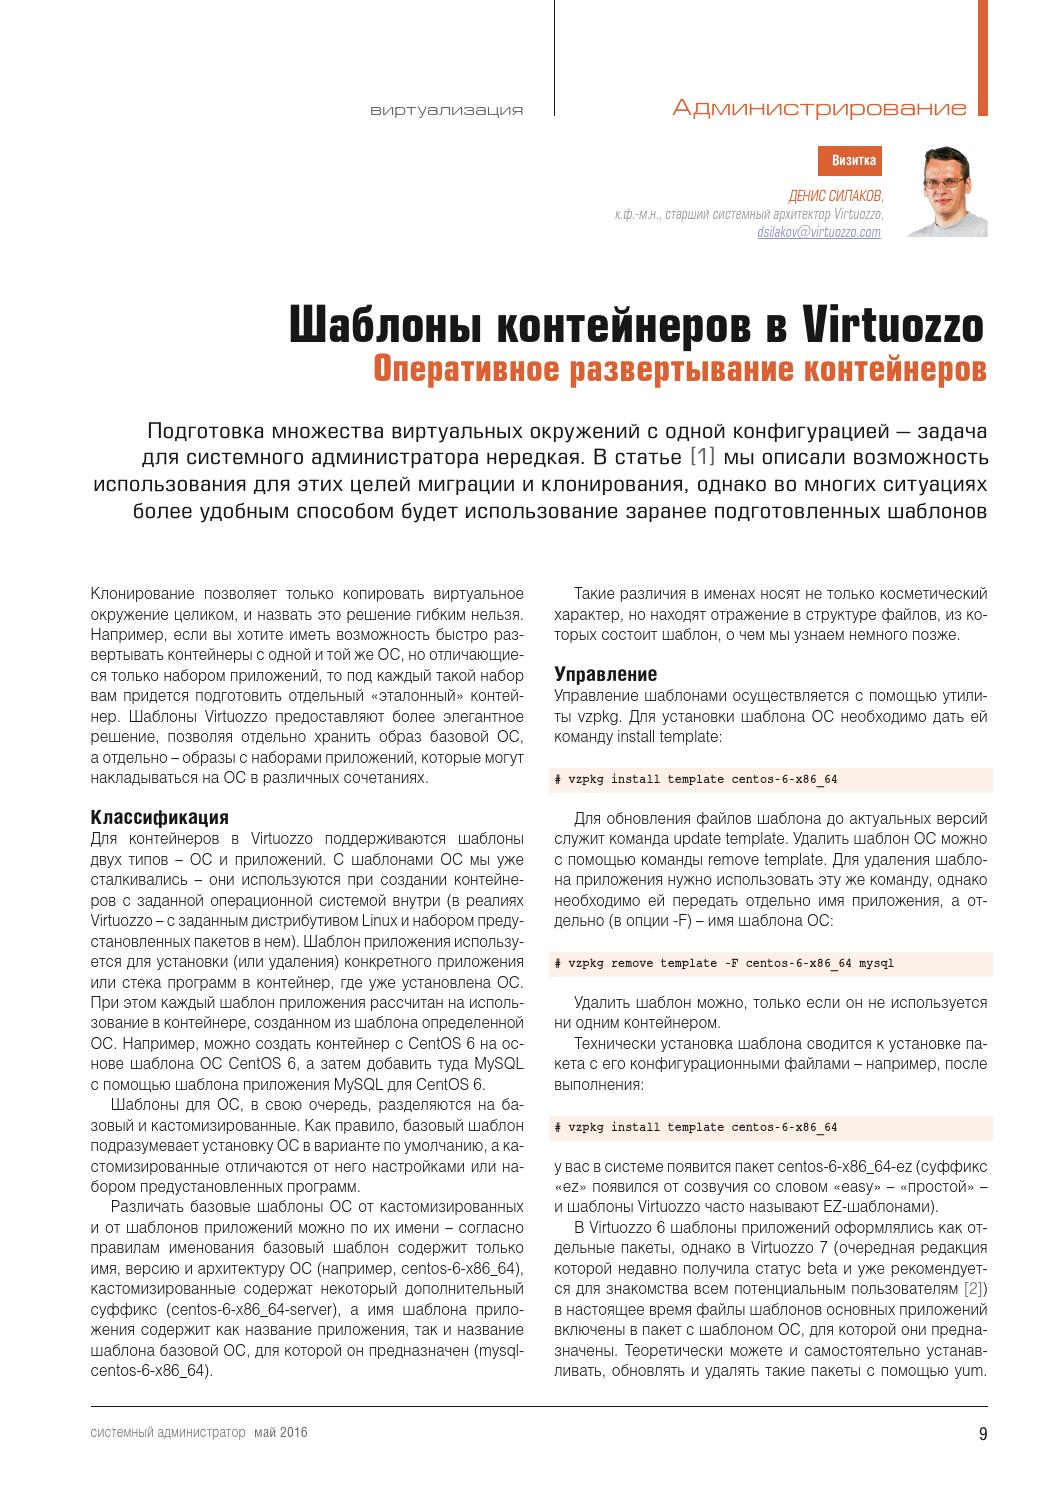 Системный администратор by anna - issuu